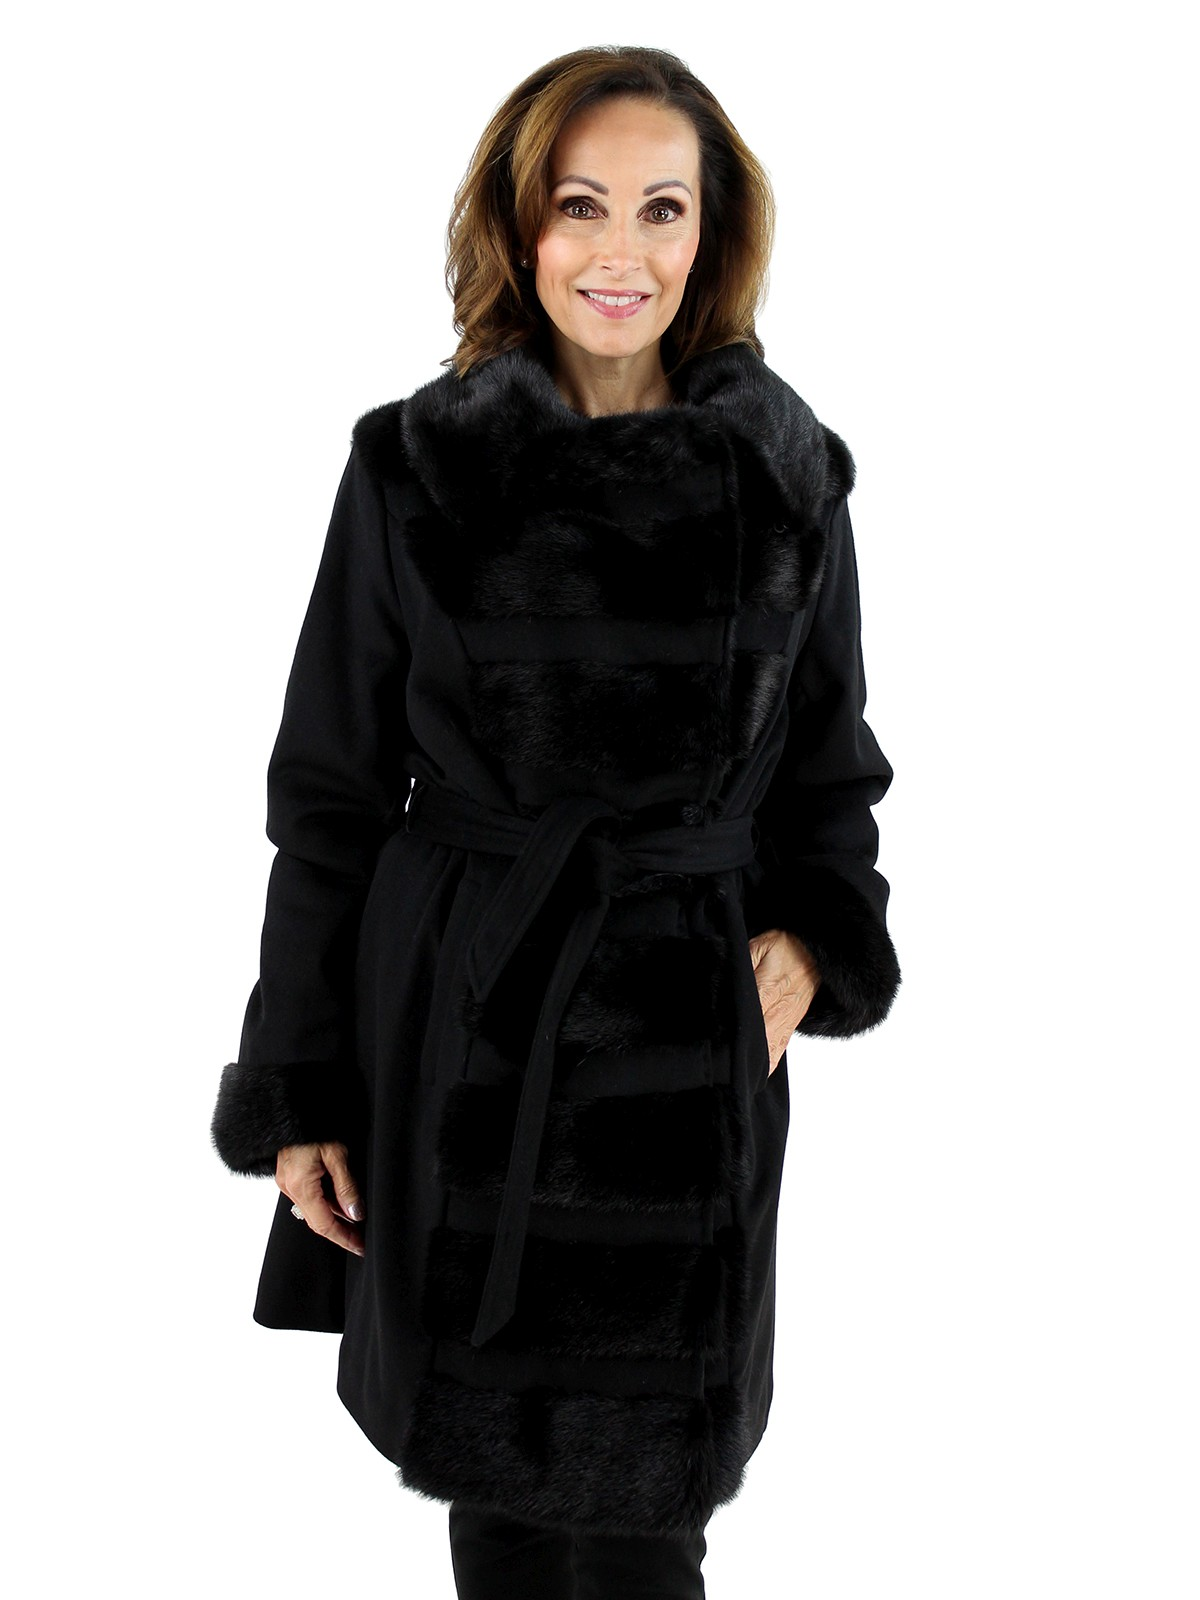 Gorski Woman's Black Mink Fur and Cashmere Wool Stroller